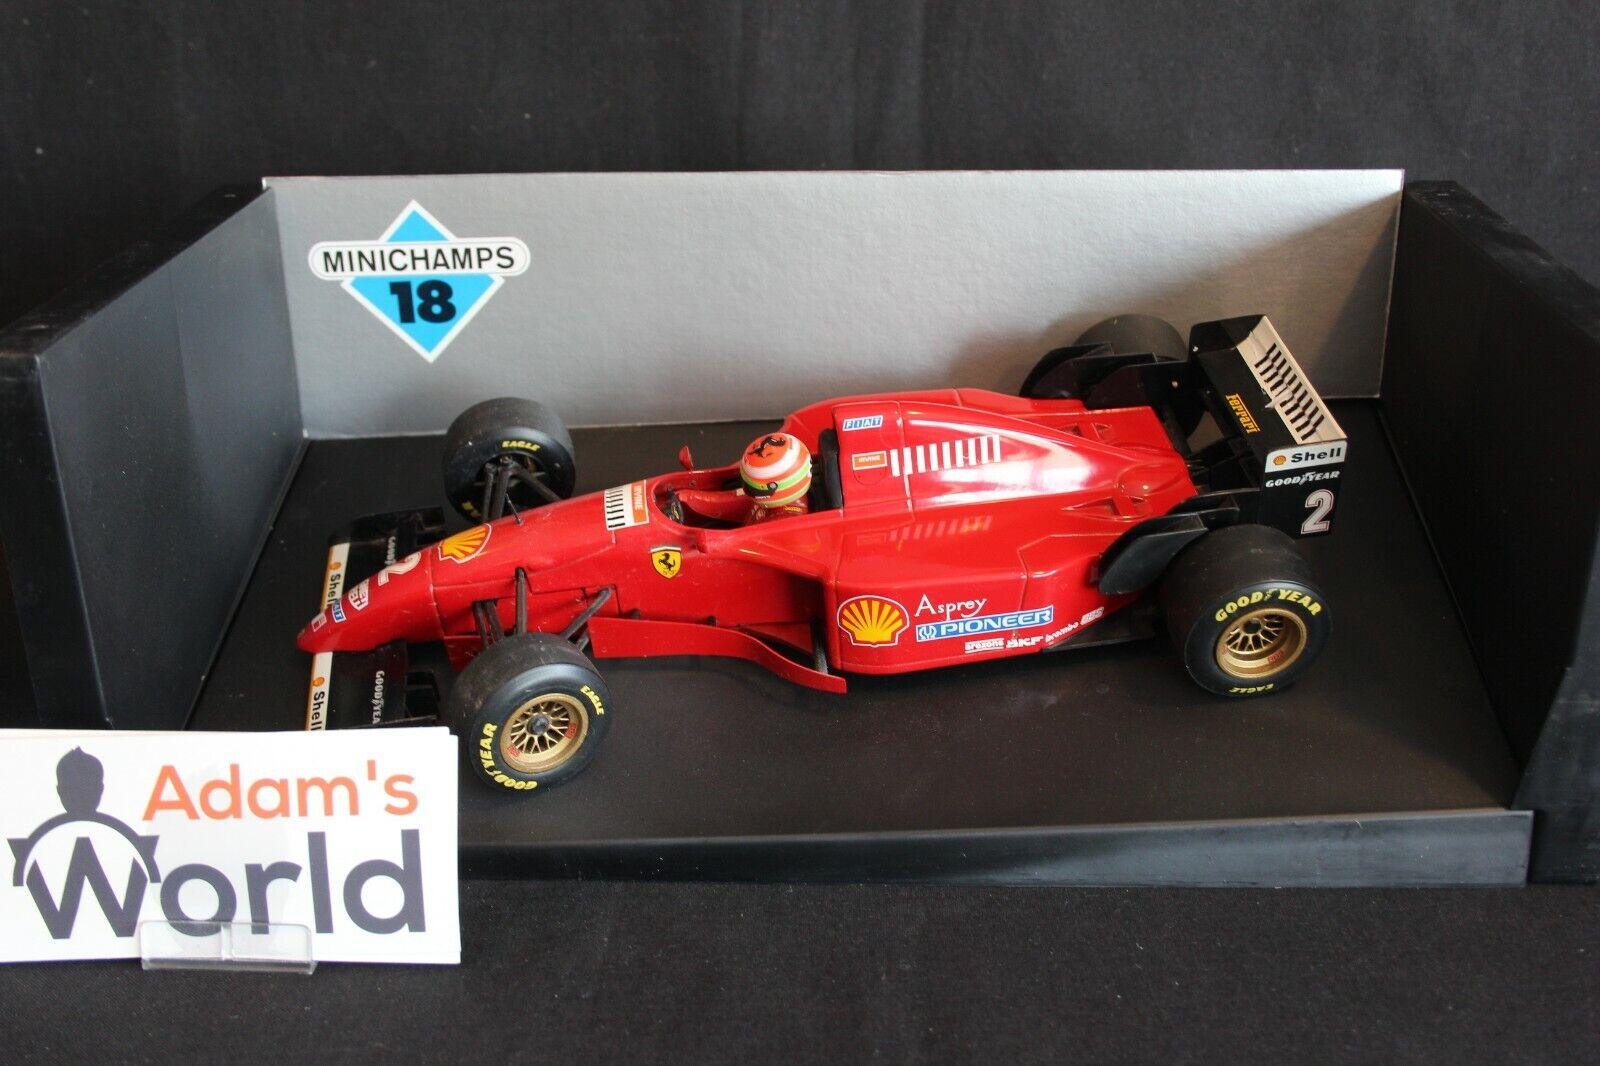 Ferrari 412 T3 1996  1  18, verso 35, 2 Edwin (GBR)